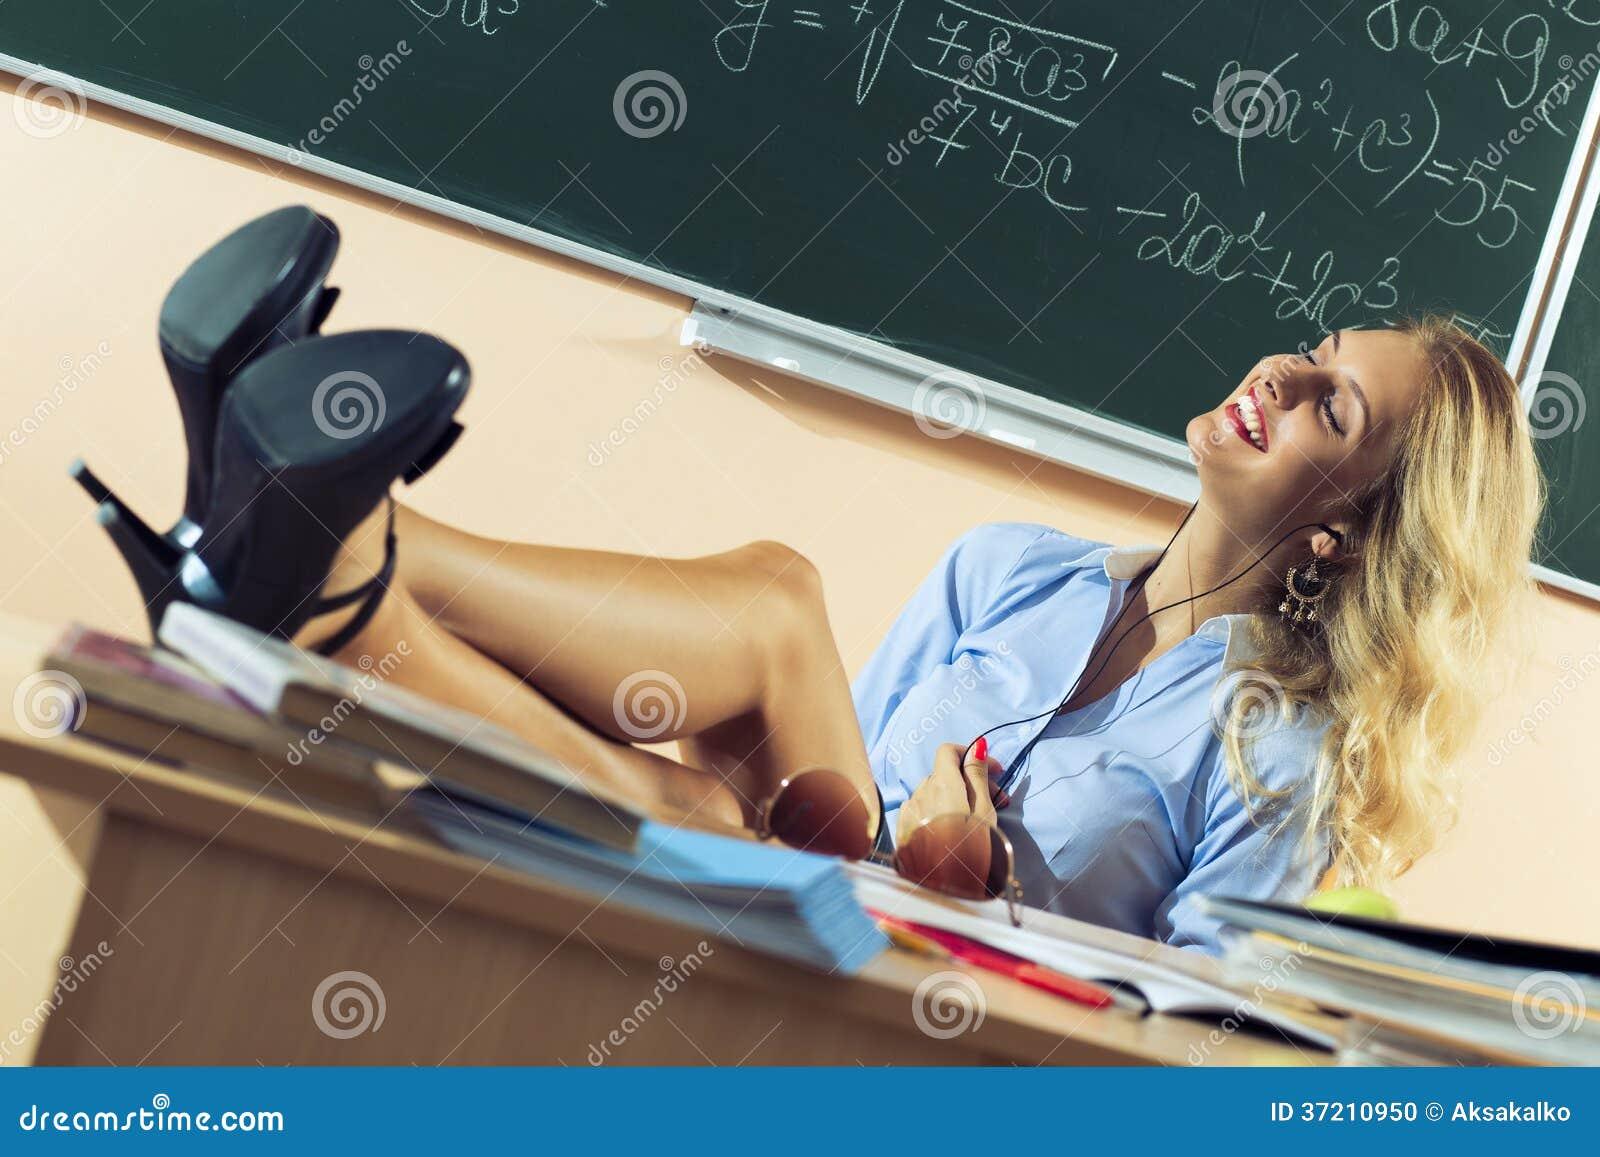 Beautiful Young Sexy Teacher Stock Photo - Image: 37210950: http://www.dreamstime.com/stock-photo-beautiful-young-sexy-teacher-resting-classes-image37210950